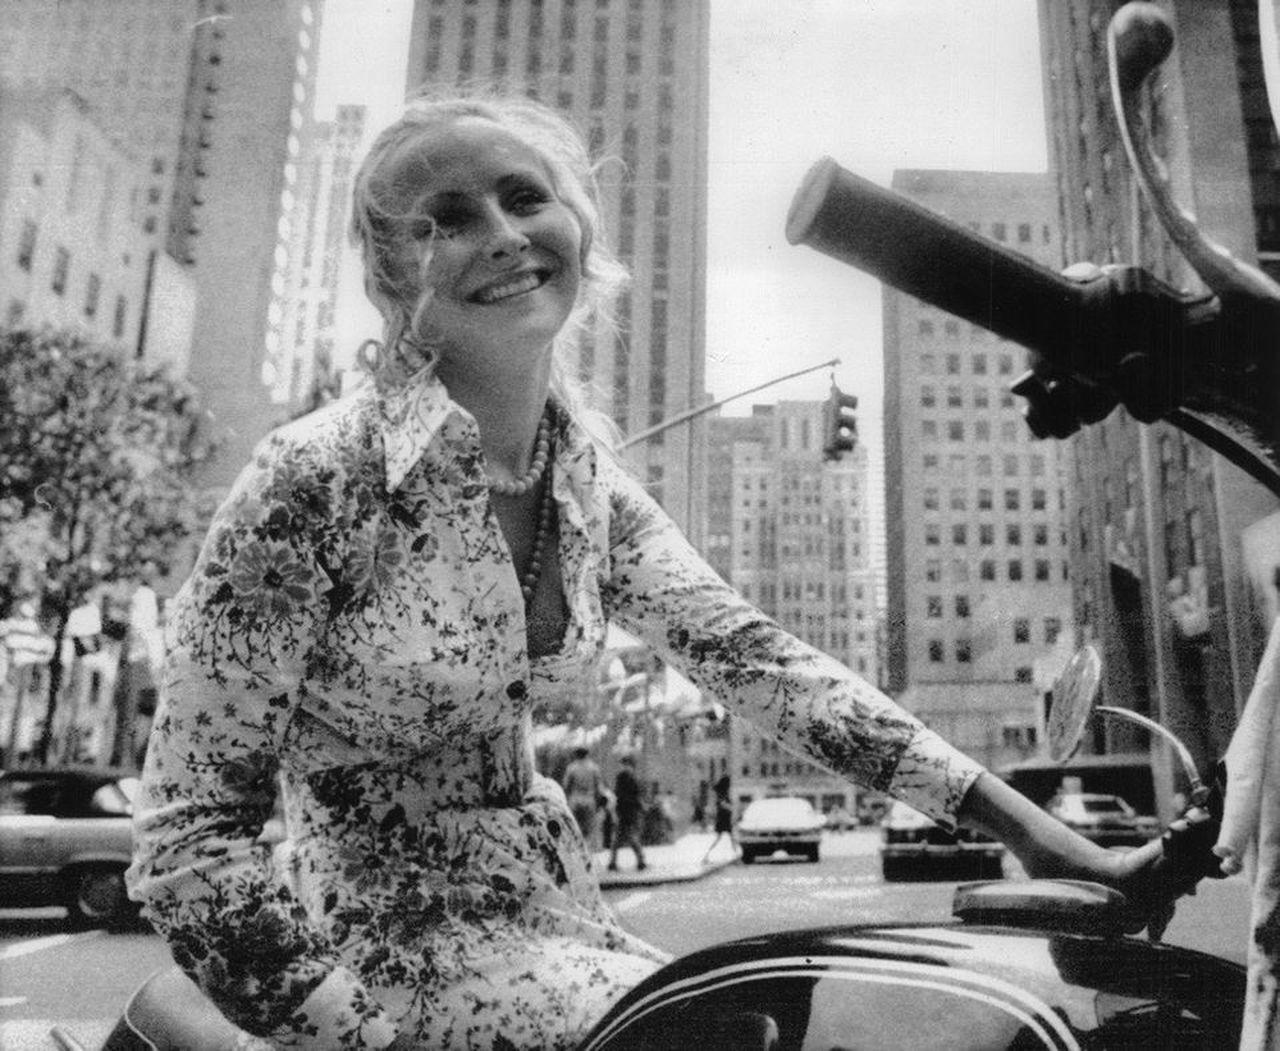 debbie lawler on bike smiling portrait